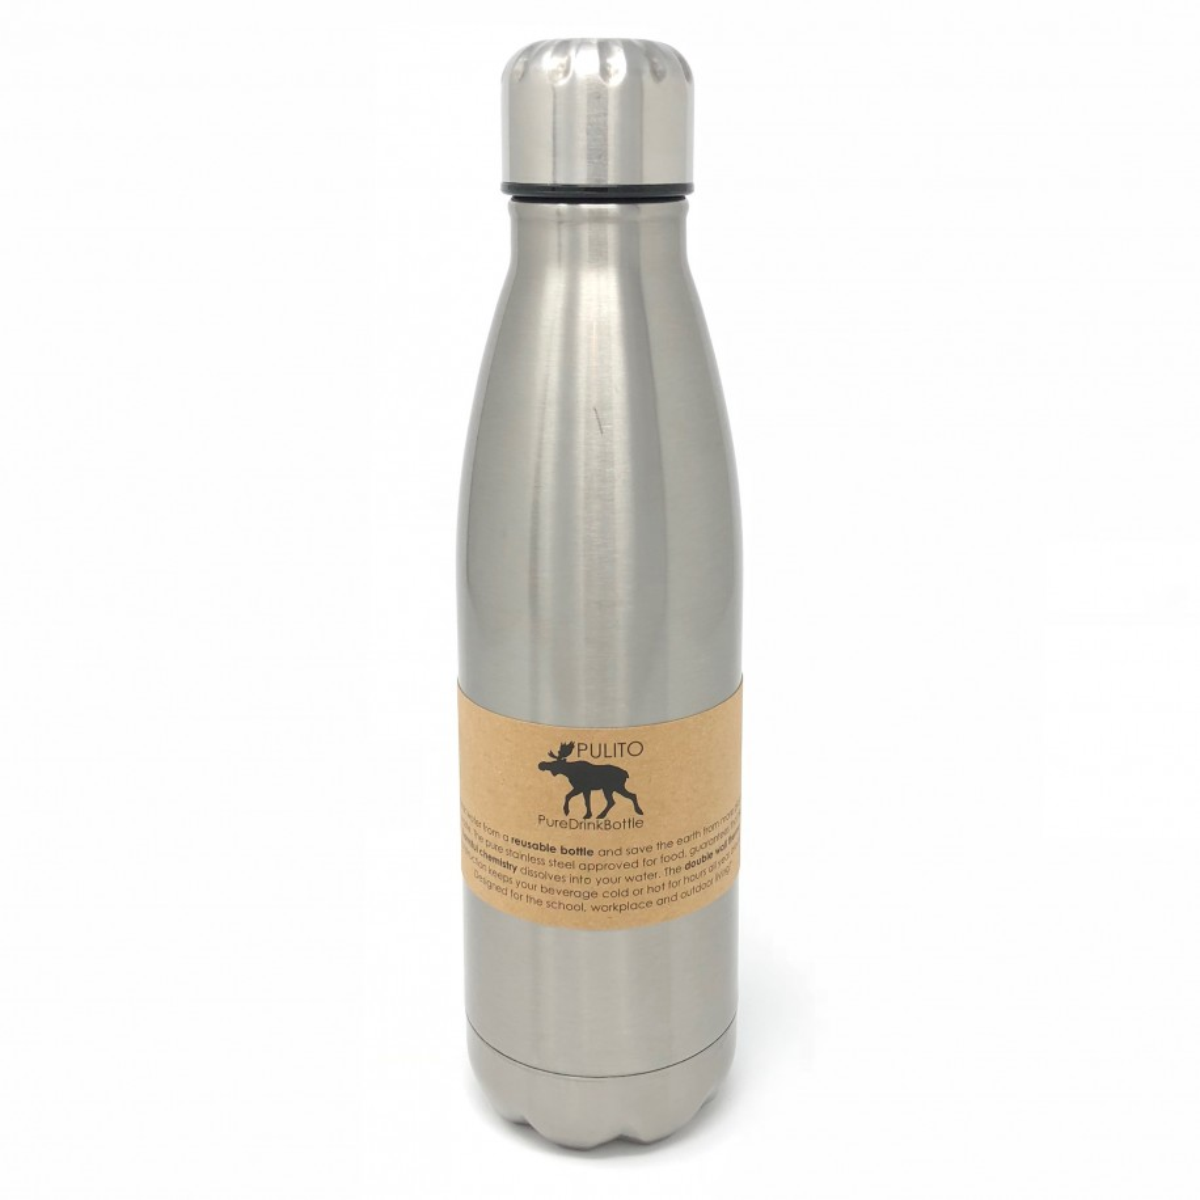 Pulito termo drikkeflaske i stål - flere str.